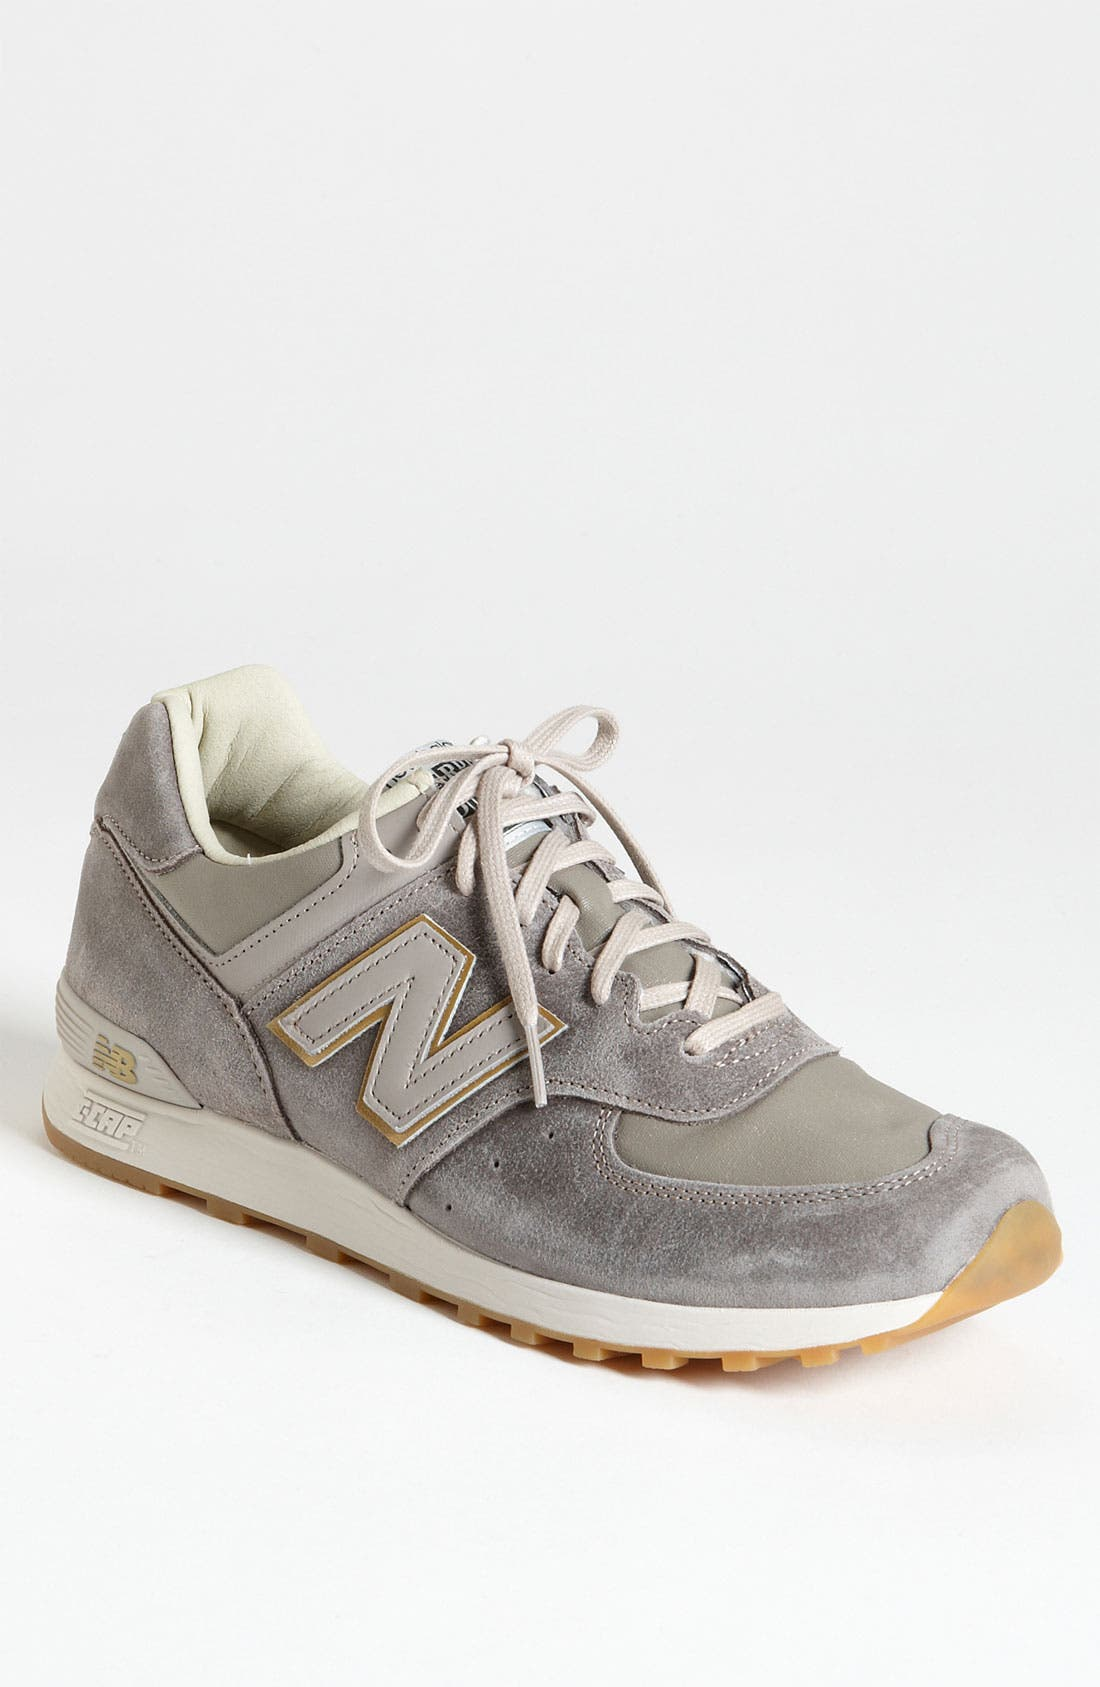 Main Image - New Balance '576 Flimby UK' Sneaker (Men)